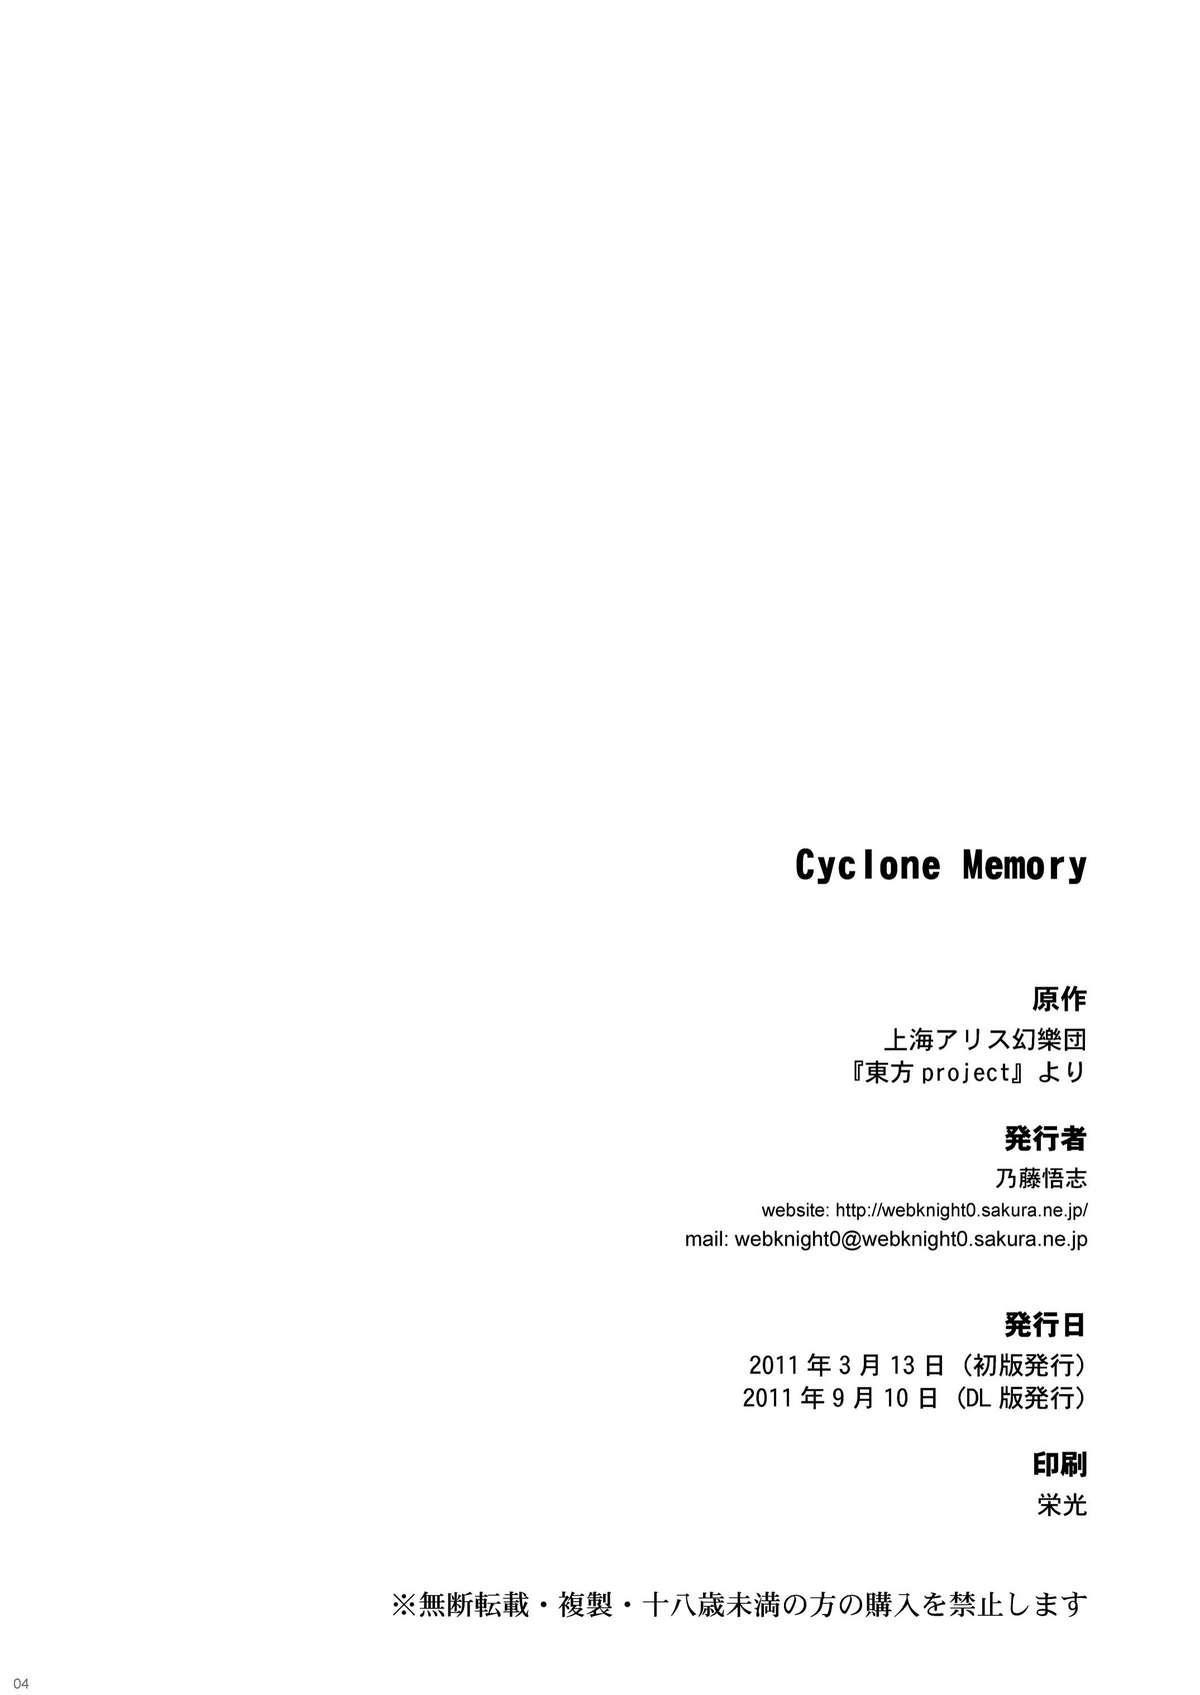 Cyclone Memory 65